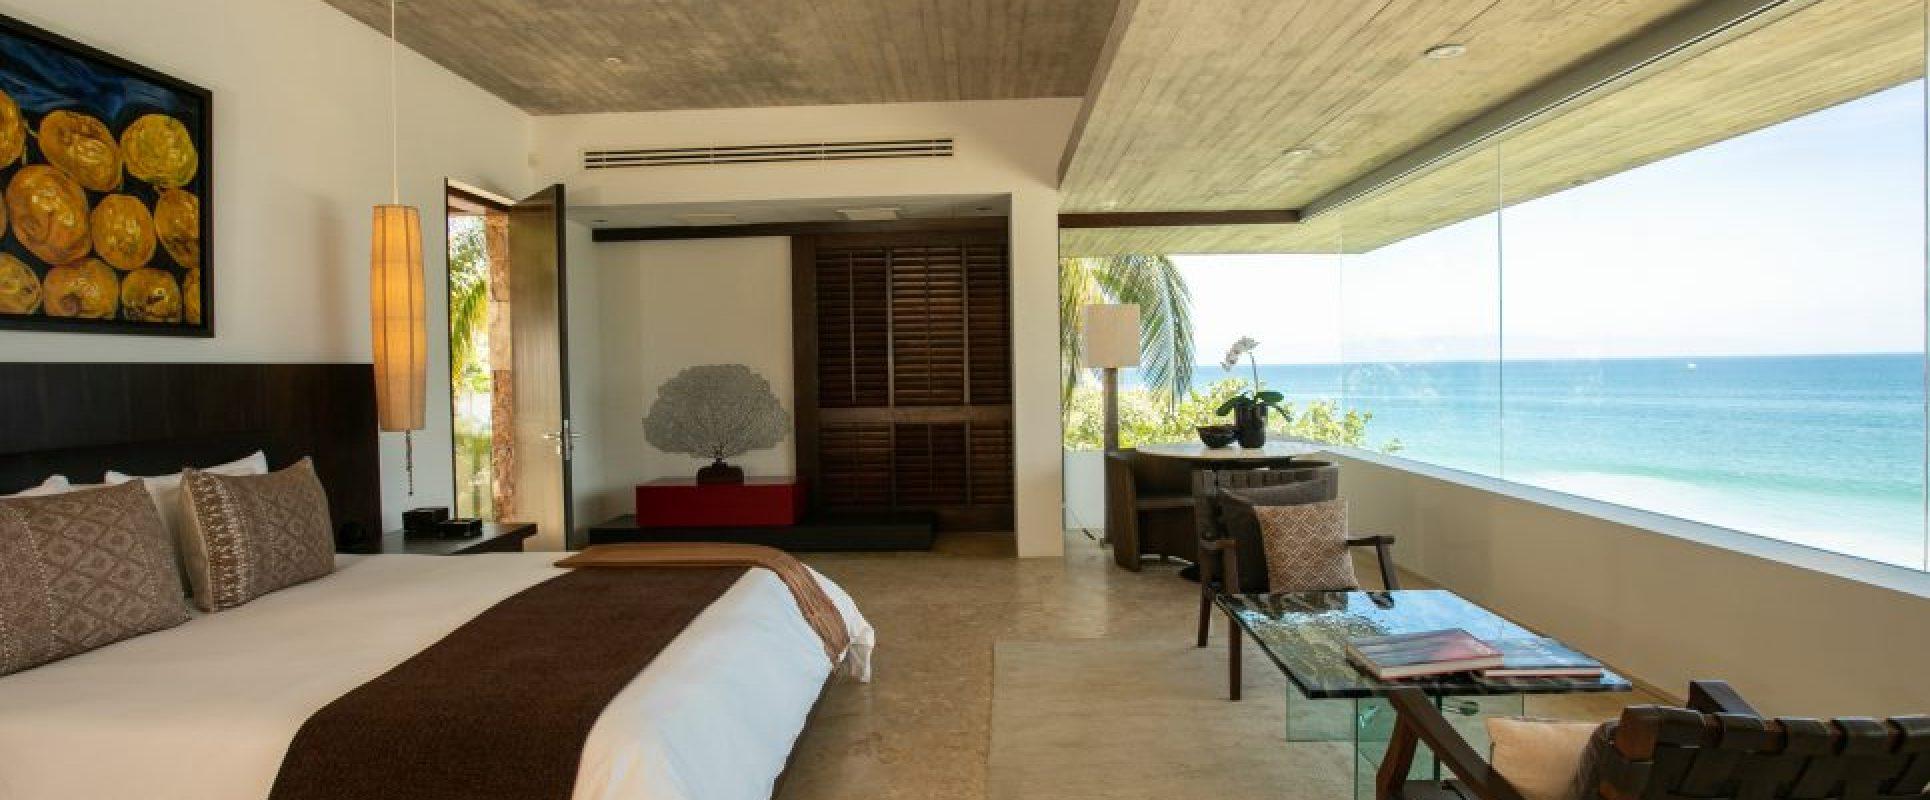 Casa Siete, Punta Mita Photo